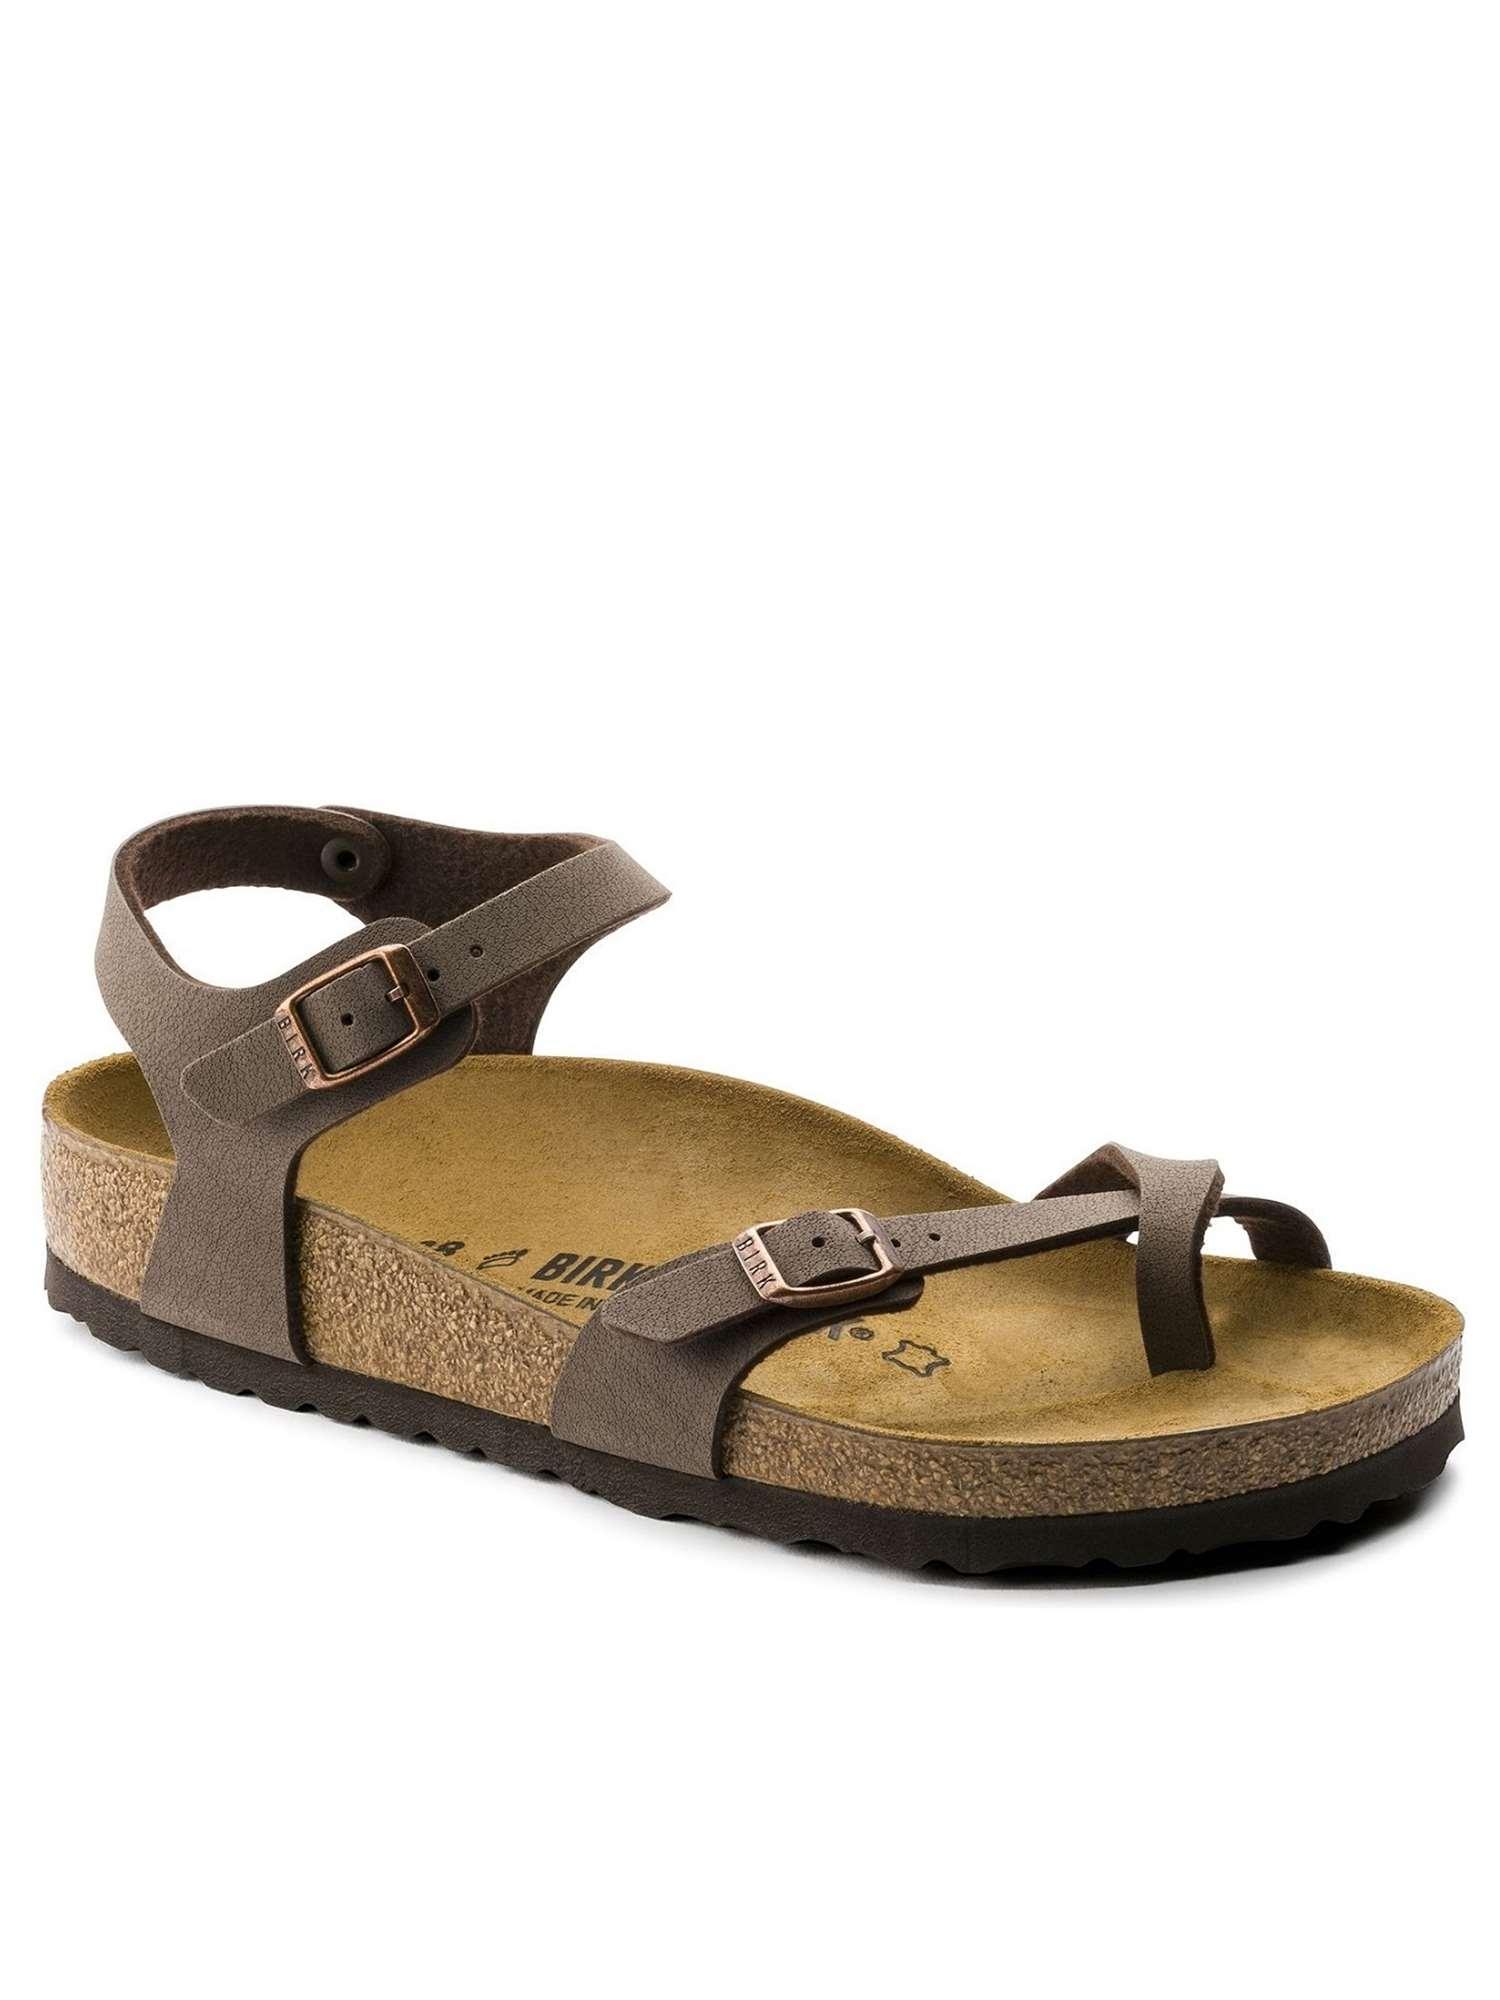 online retailer df8d9 f07e8 Birkenstock Sandalo Taupe | Sandalo Donna Econubuk | Tania ...